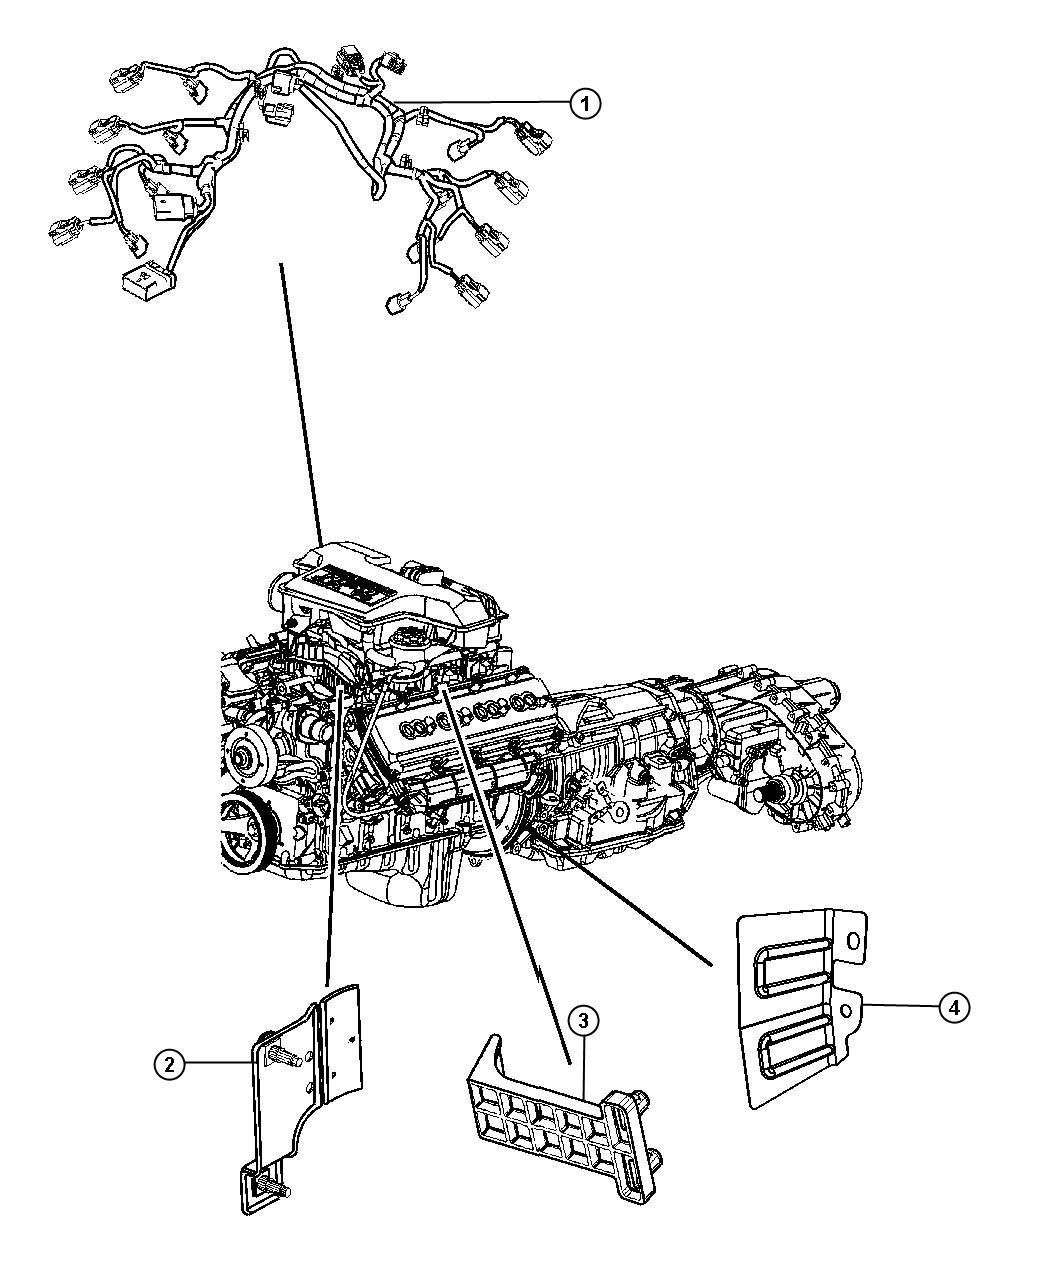 2011 Dodge Ram 3500 Bracket. Engine wiring. [all vehicles